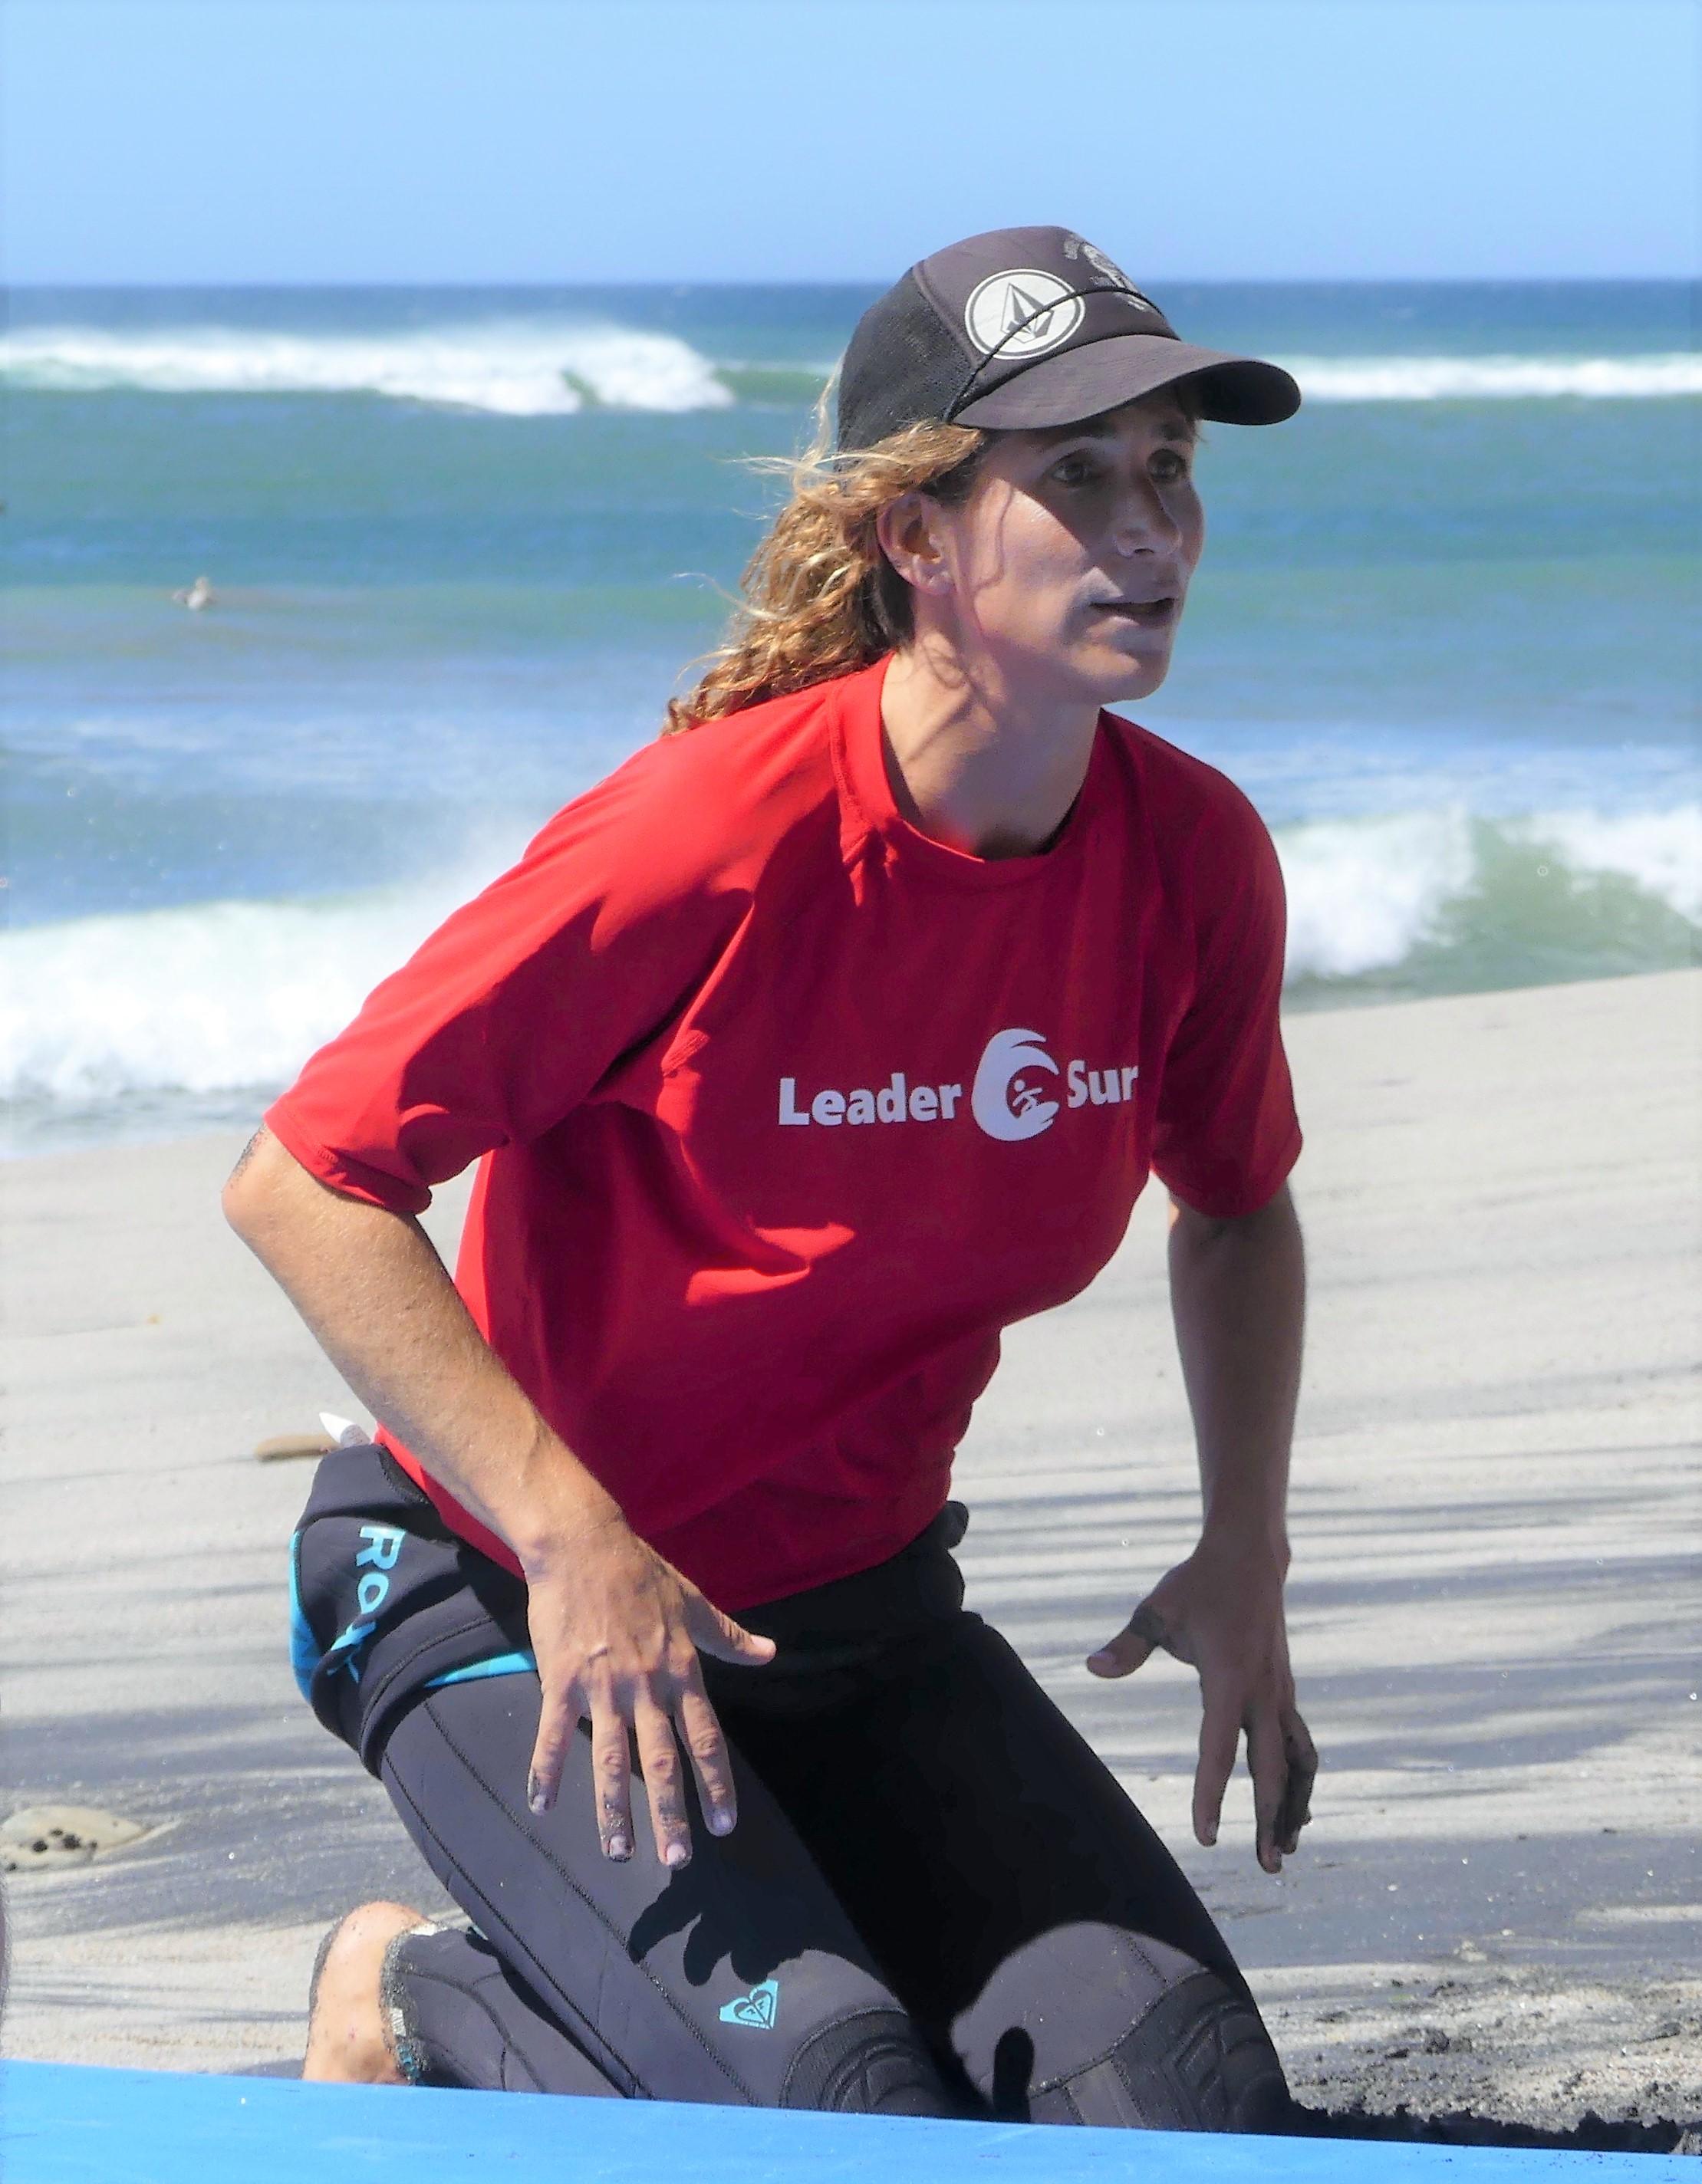 Aura Boulton LeaderSurf Surf Instructor